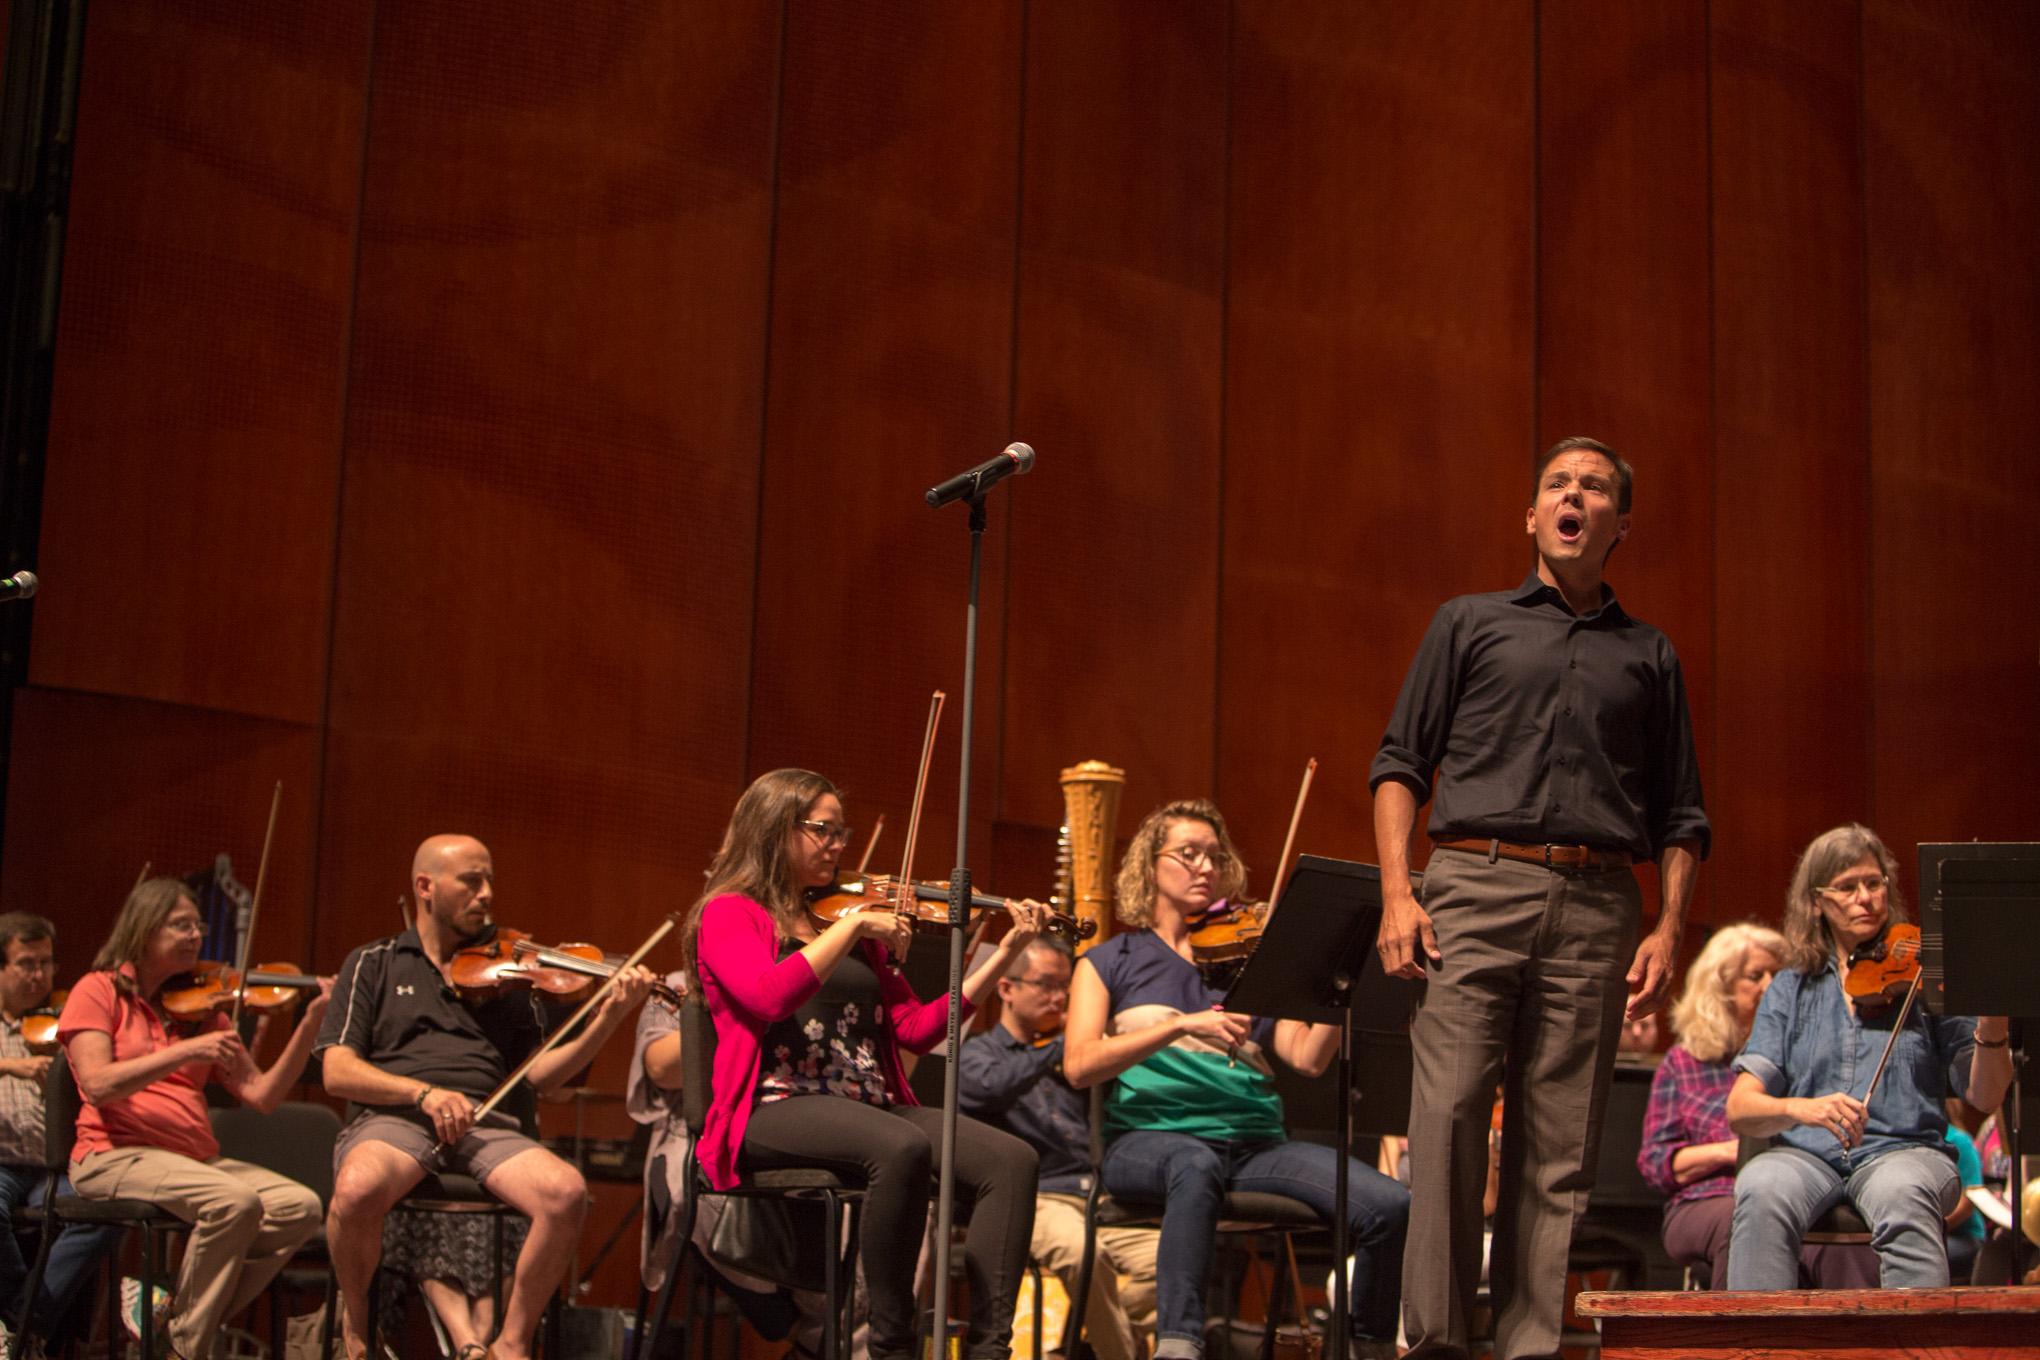 Metropolitan Opera Tenor and San Antonio native David Portillo rehearses for Look at the World at the Tobin Center in downtown San Antonio.